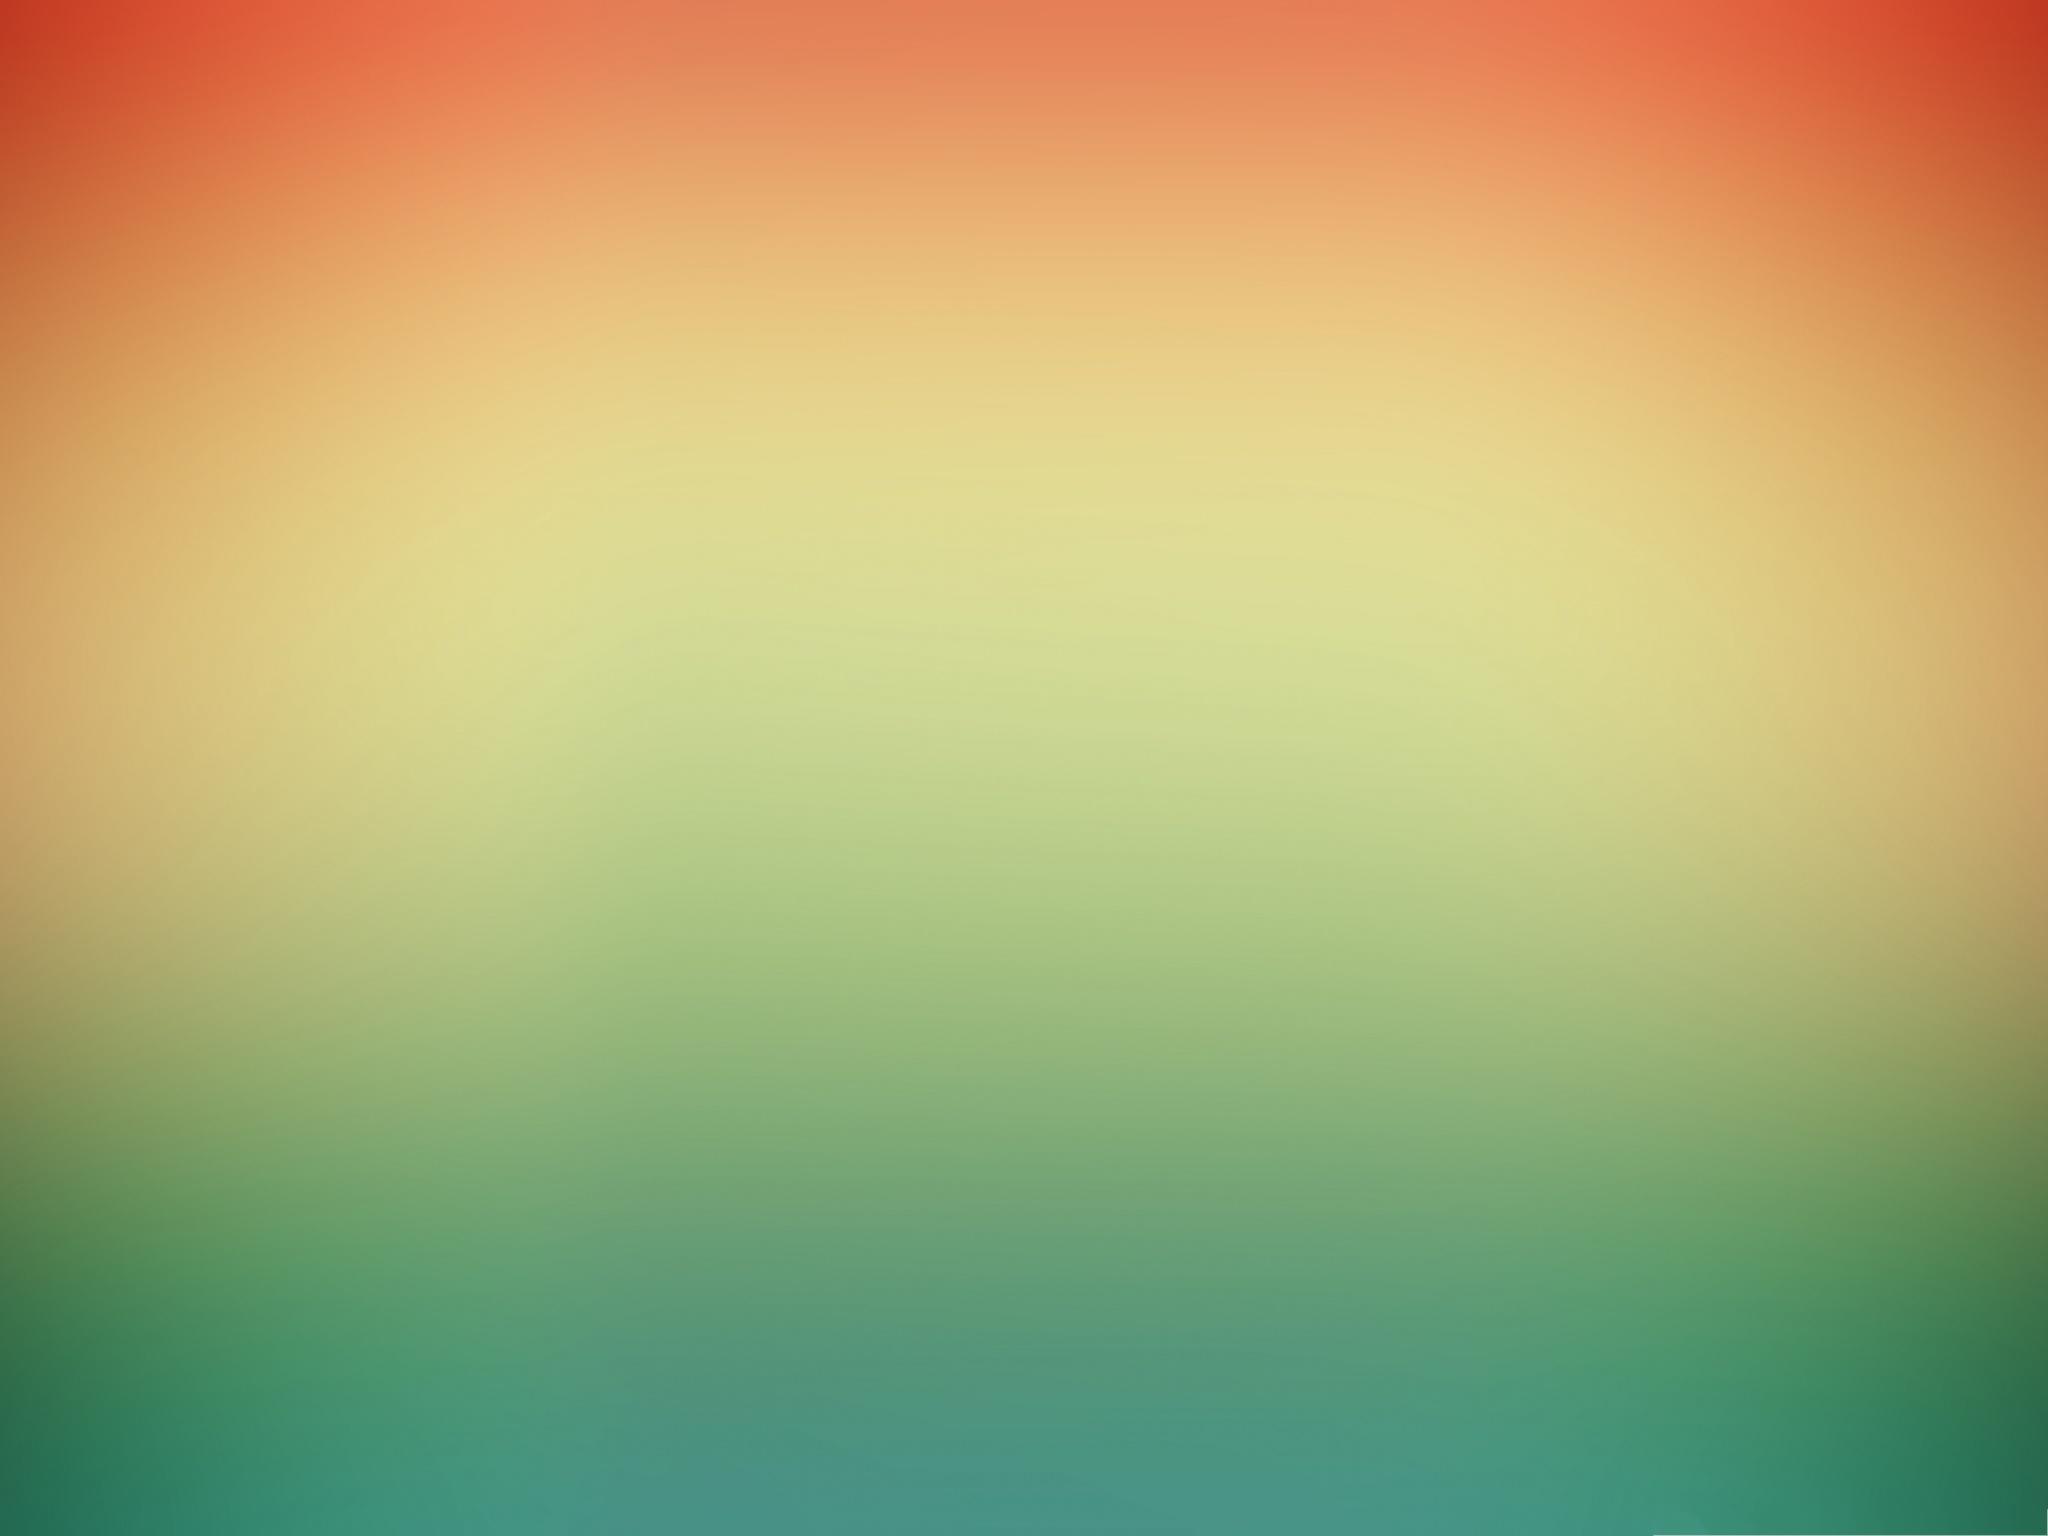 download colors hd wallpaper - photo #41